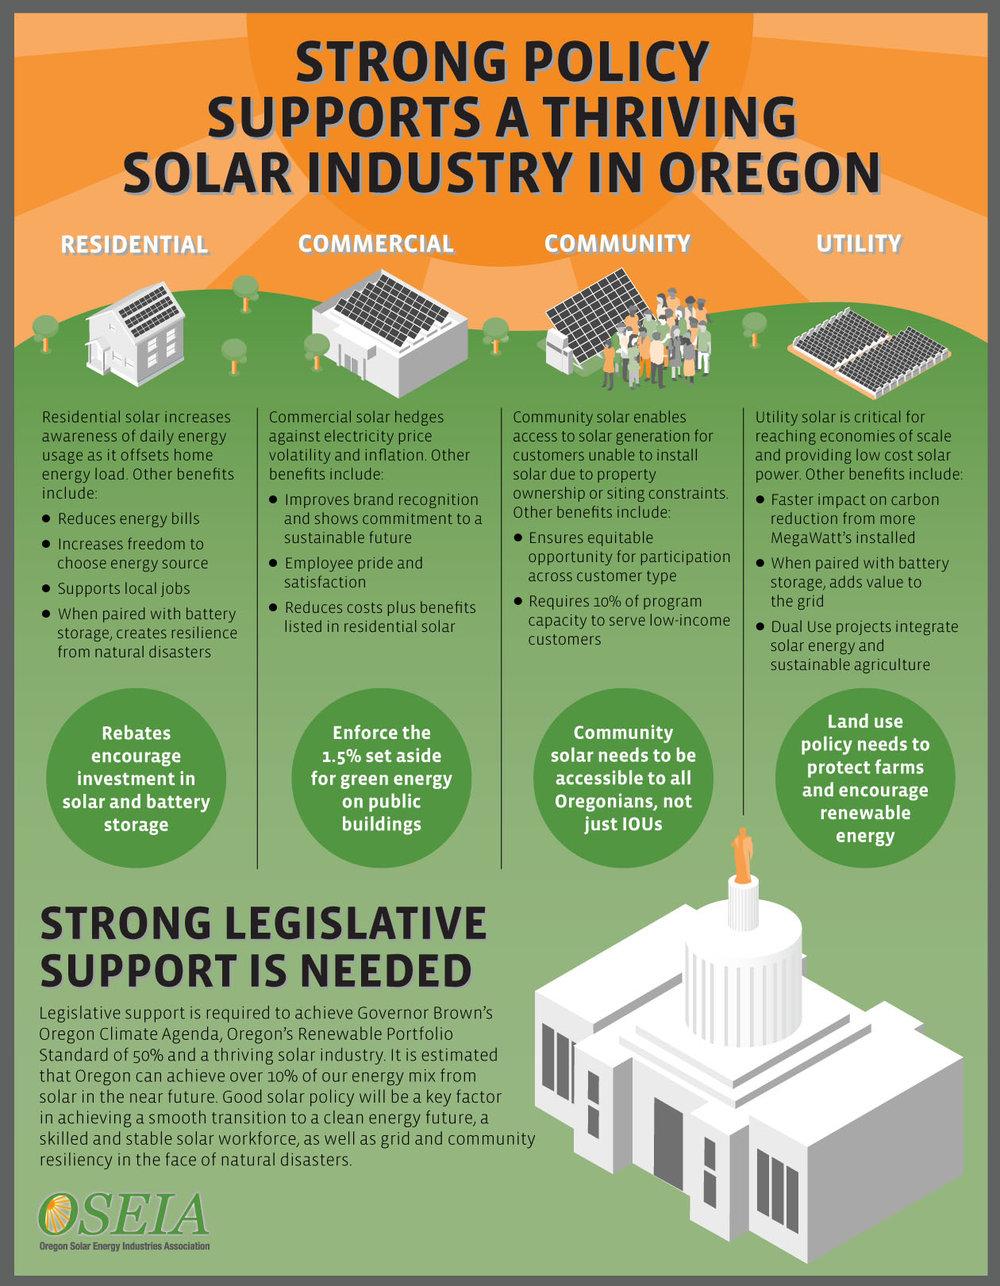 OSEIA_Thriving_Solar_Industry.jpg